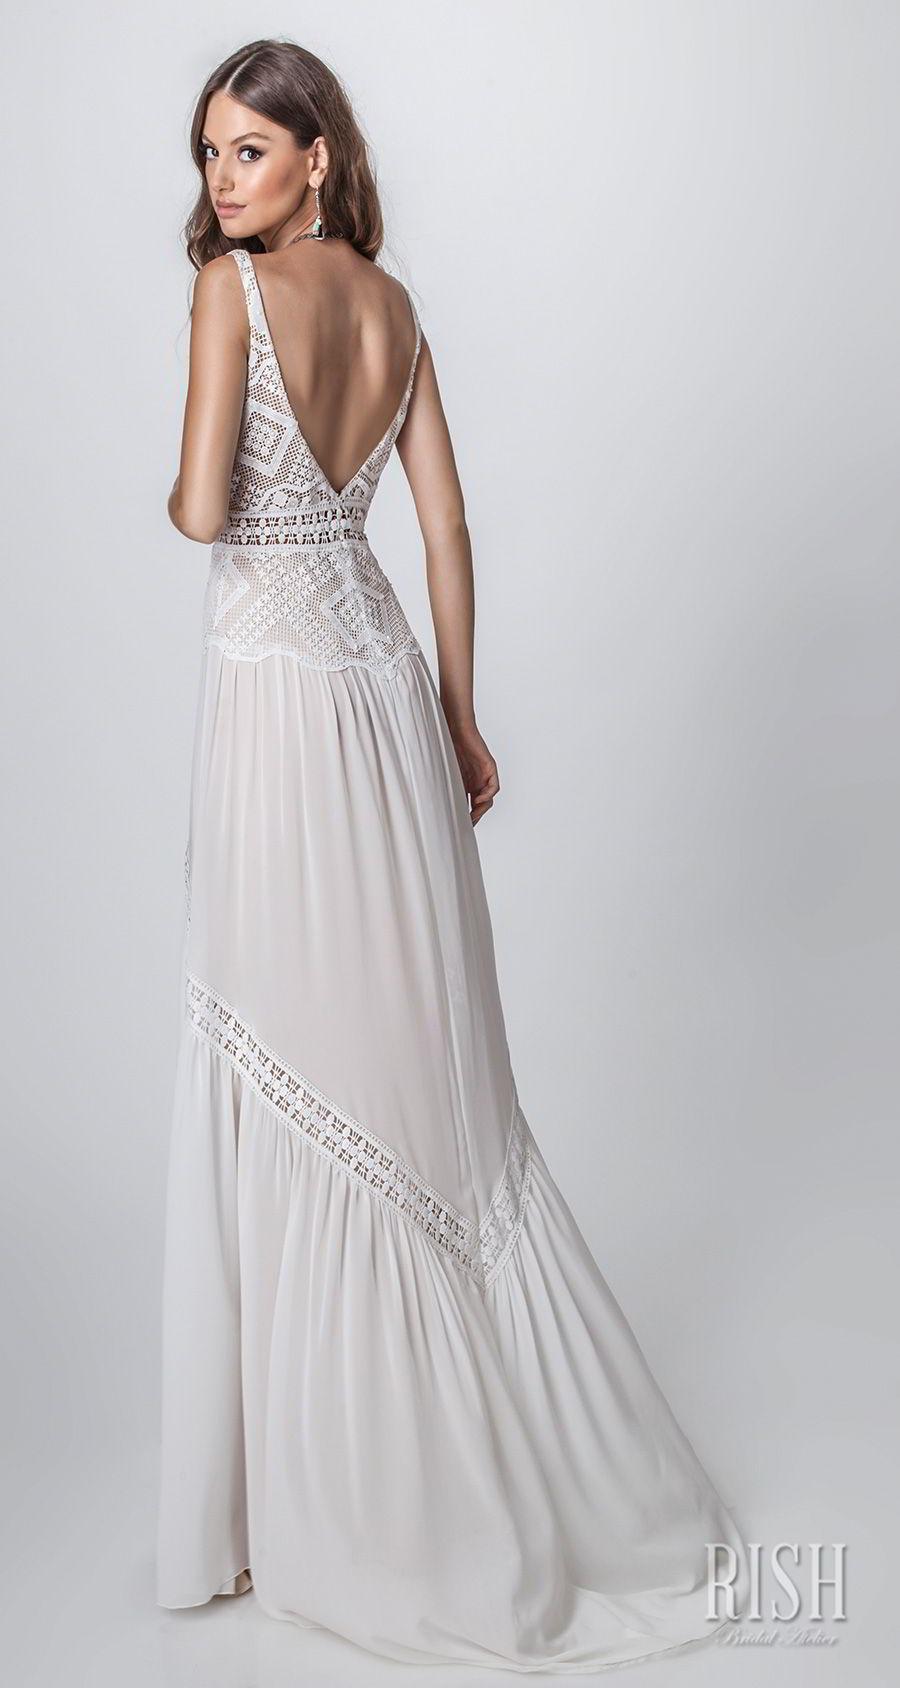 Rish Bridal Sun Dance 2018 Sleeveless Deep Sweetheart Neckline Heavily Embellished Bodice Bohemian Soft A Line